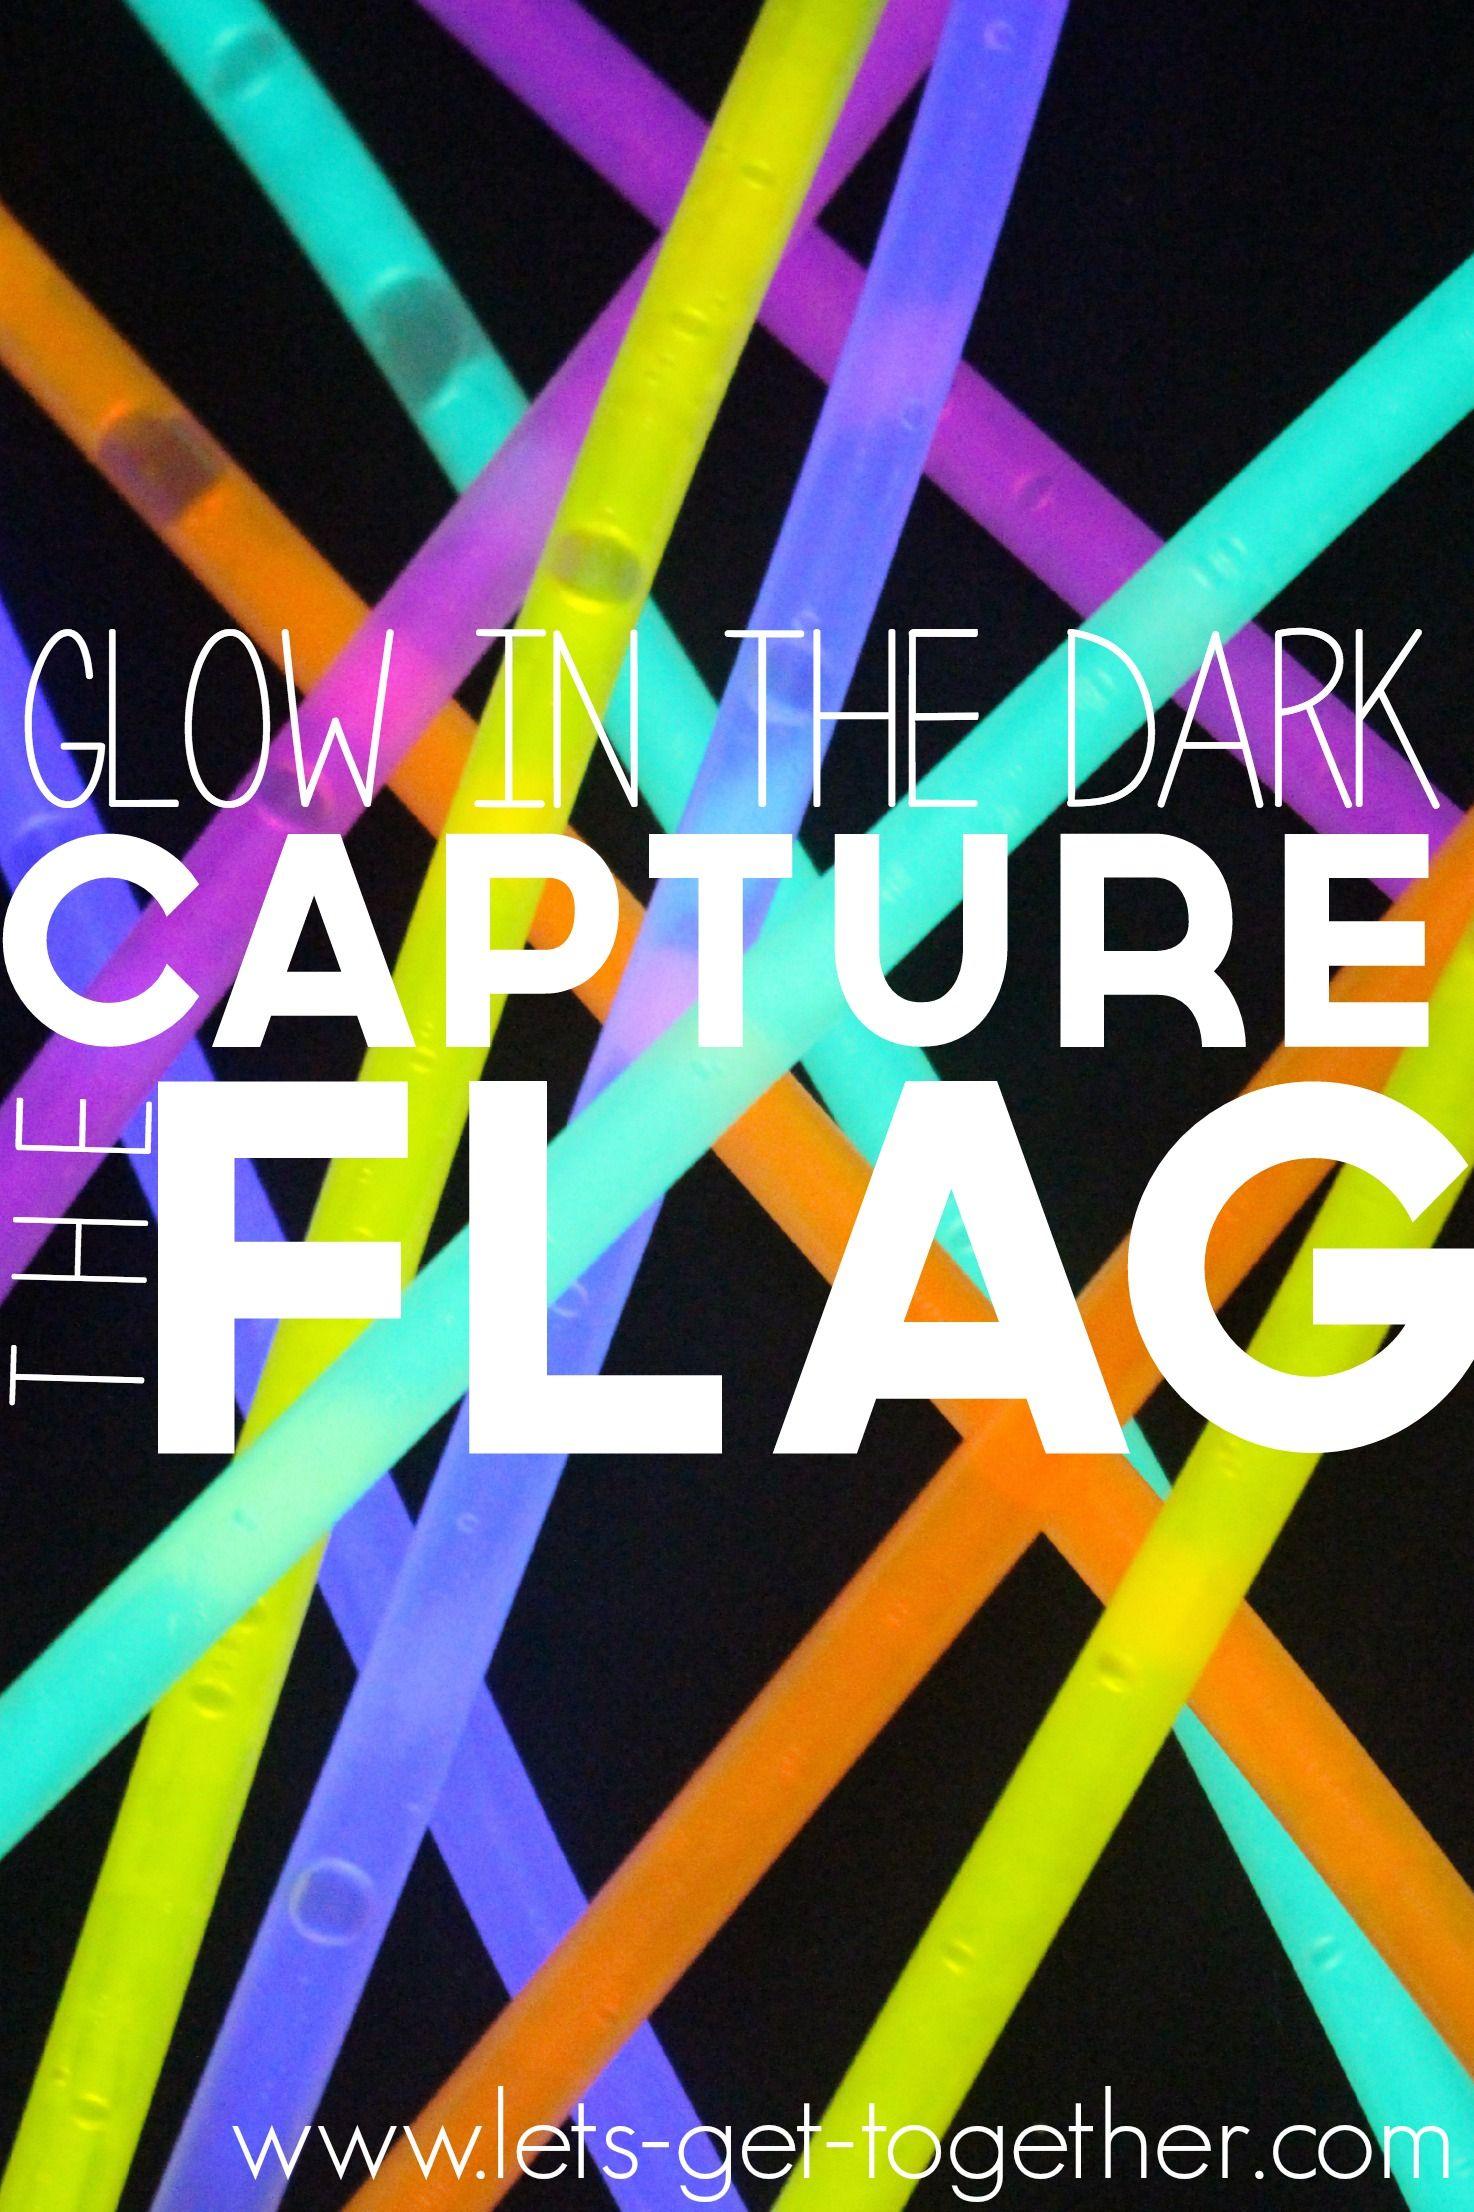 Glow In The Dark Capture Flag